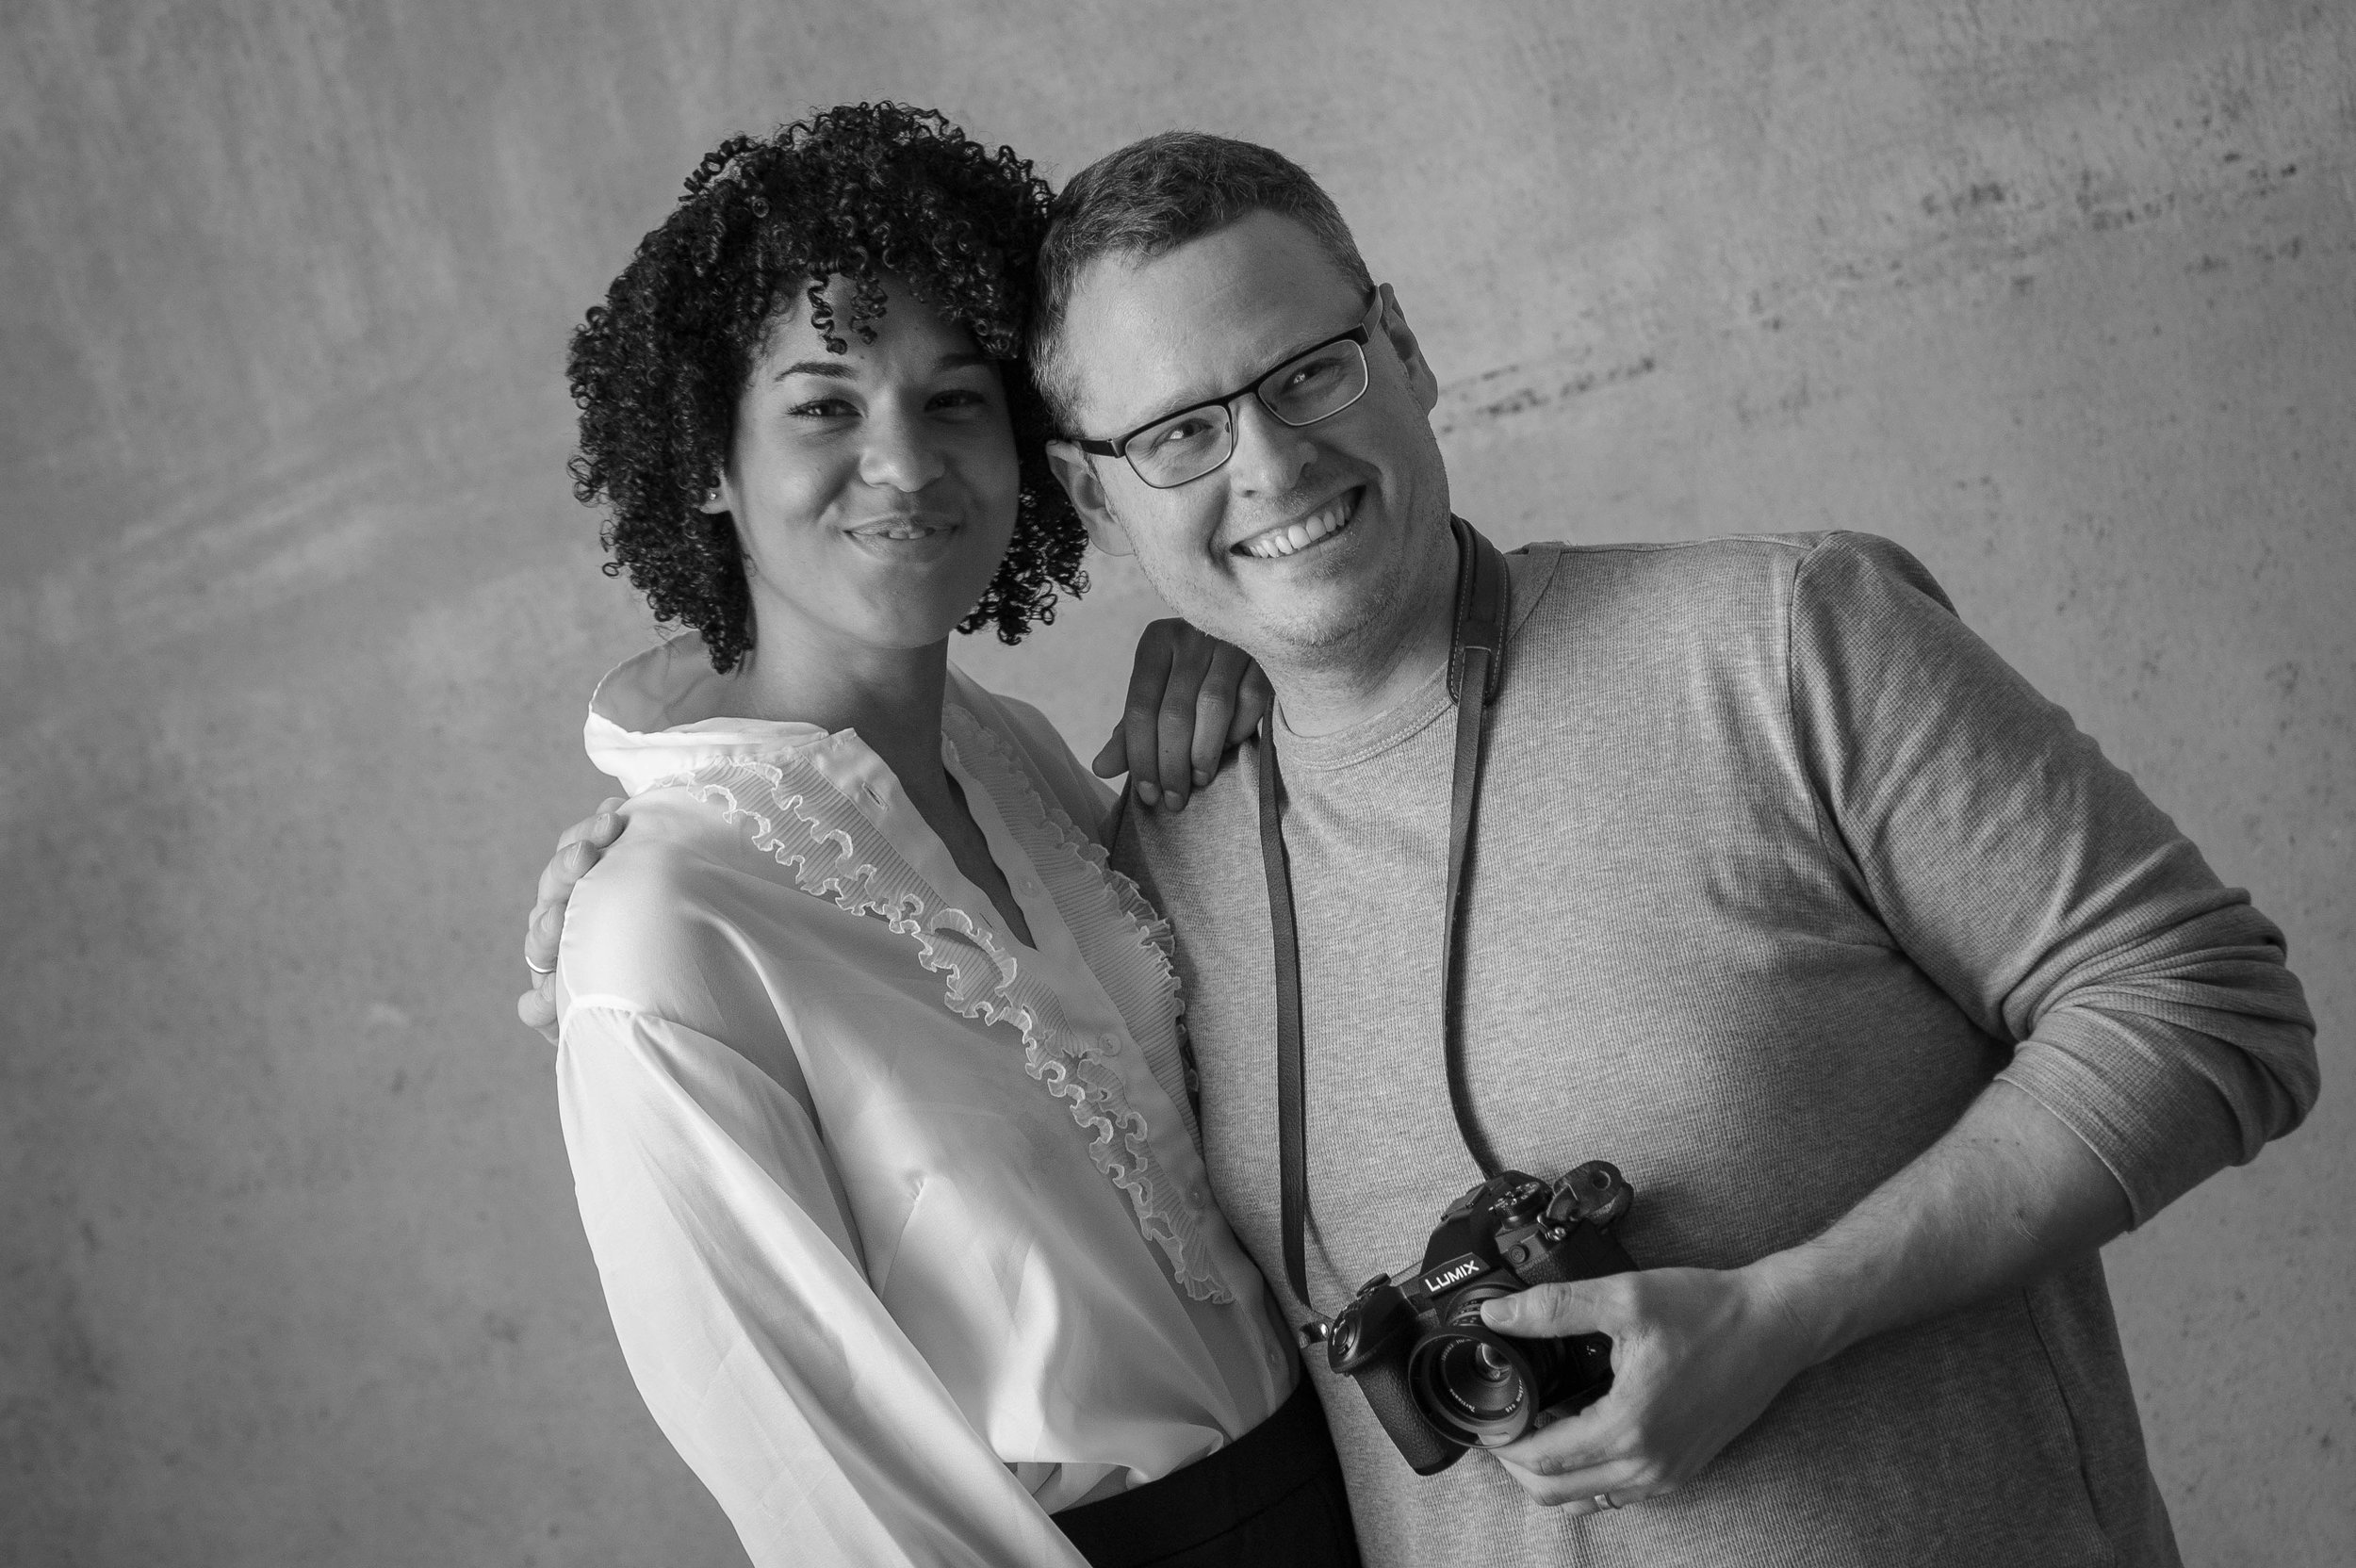 Fotograf Bonn Daniel Hammelstein Portraitfotograf Workshops Portrait Bonn Lumix.jpg